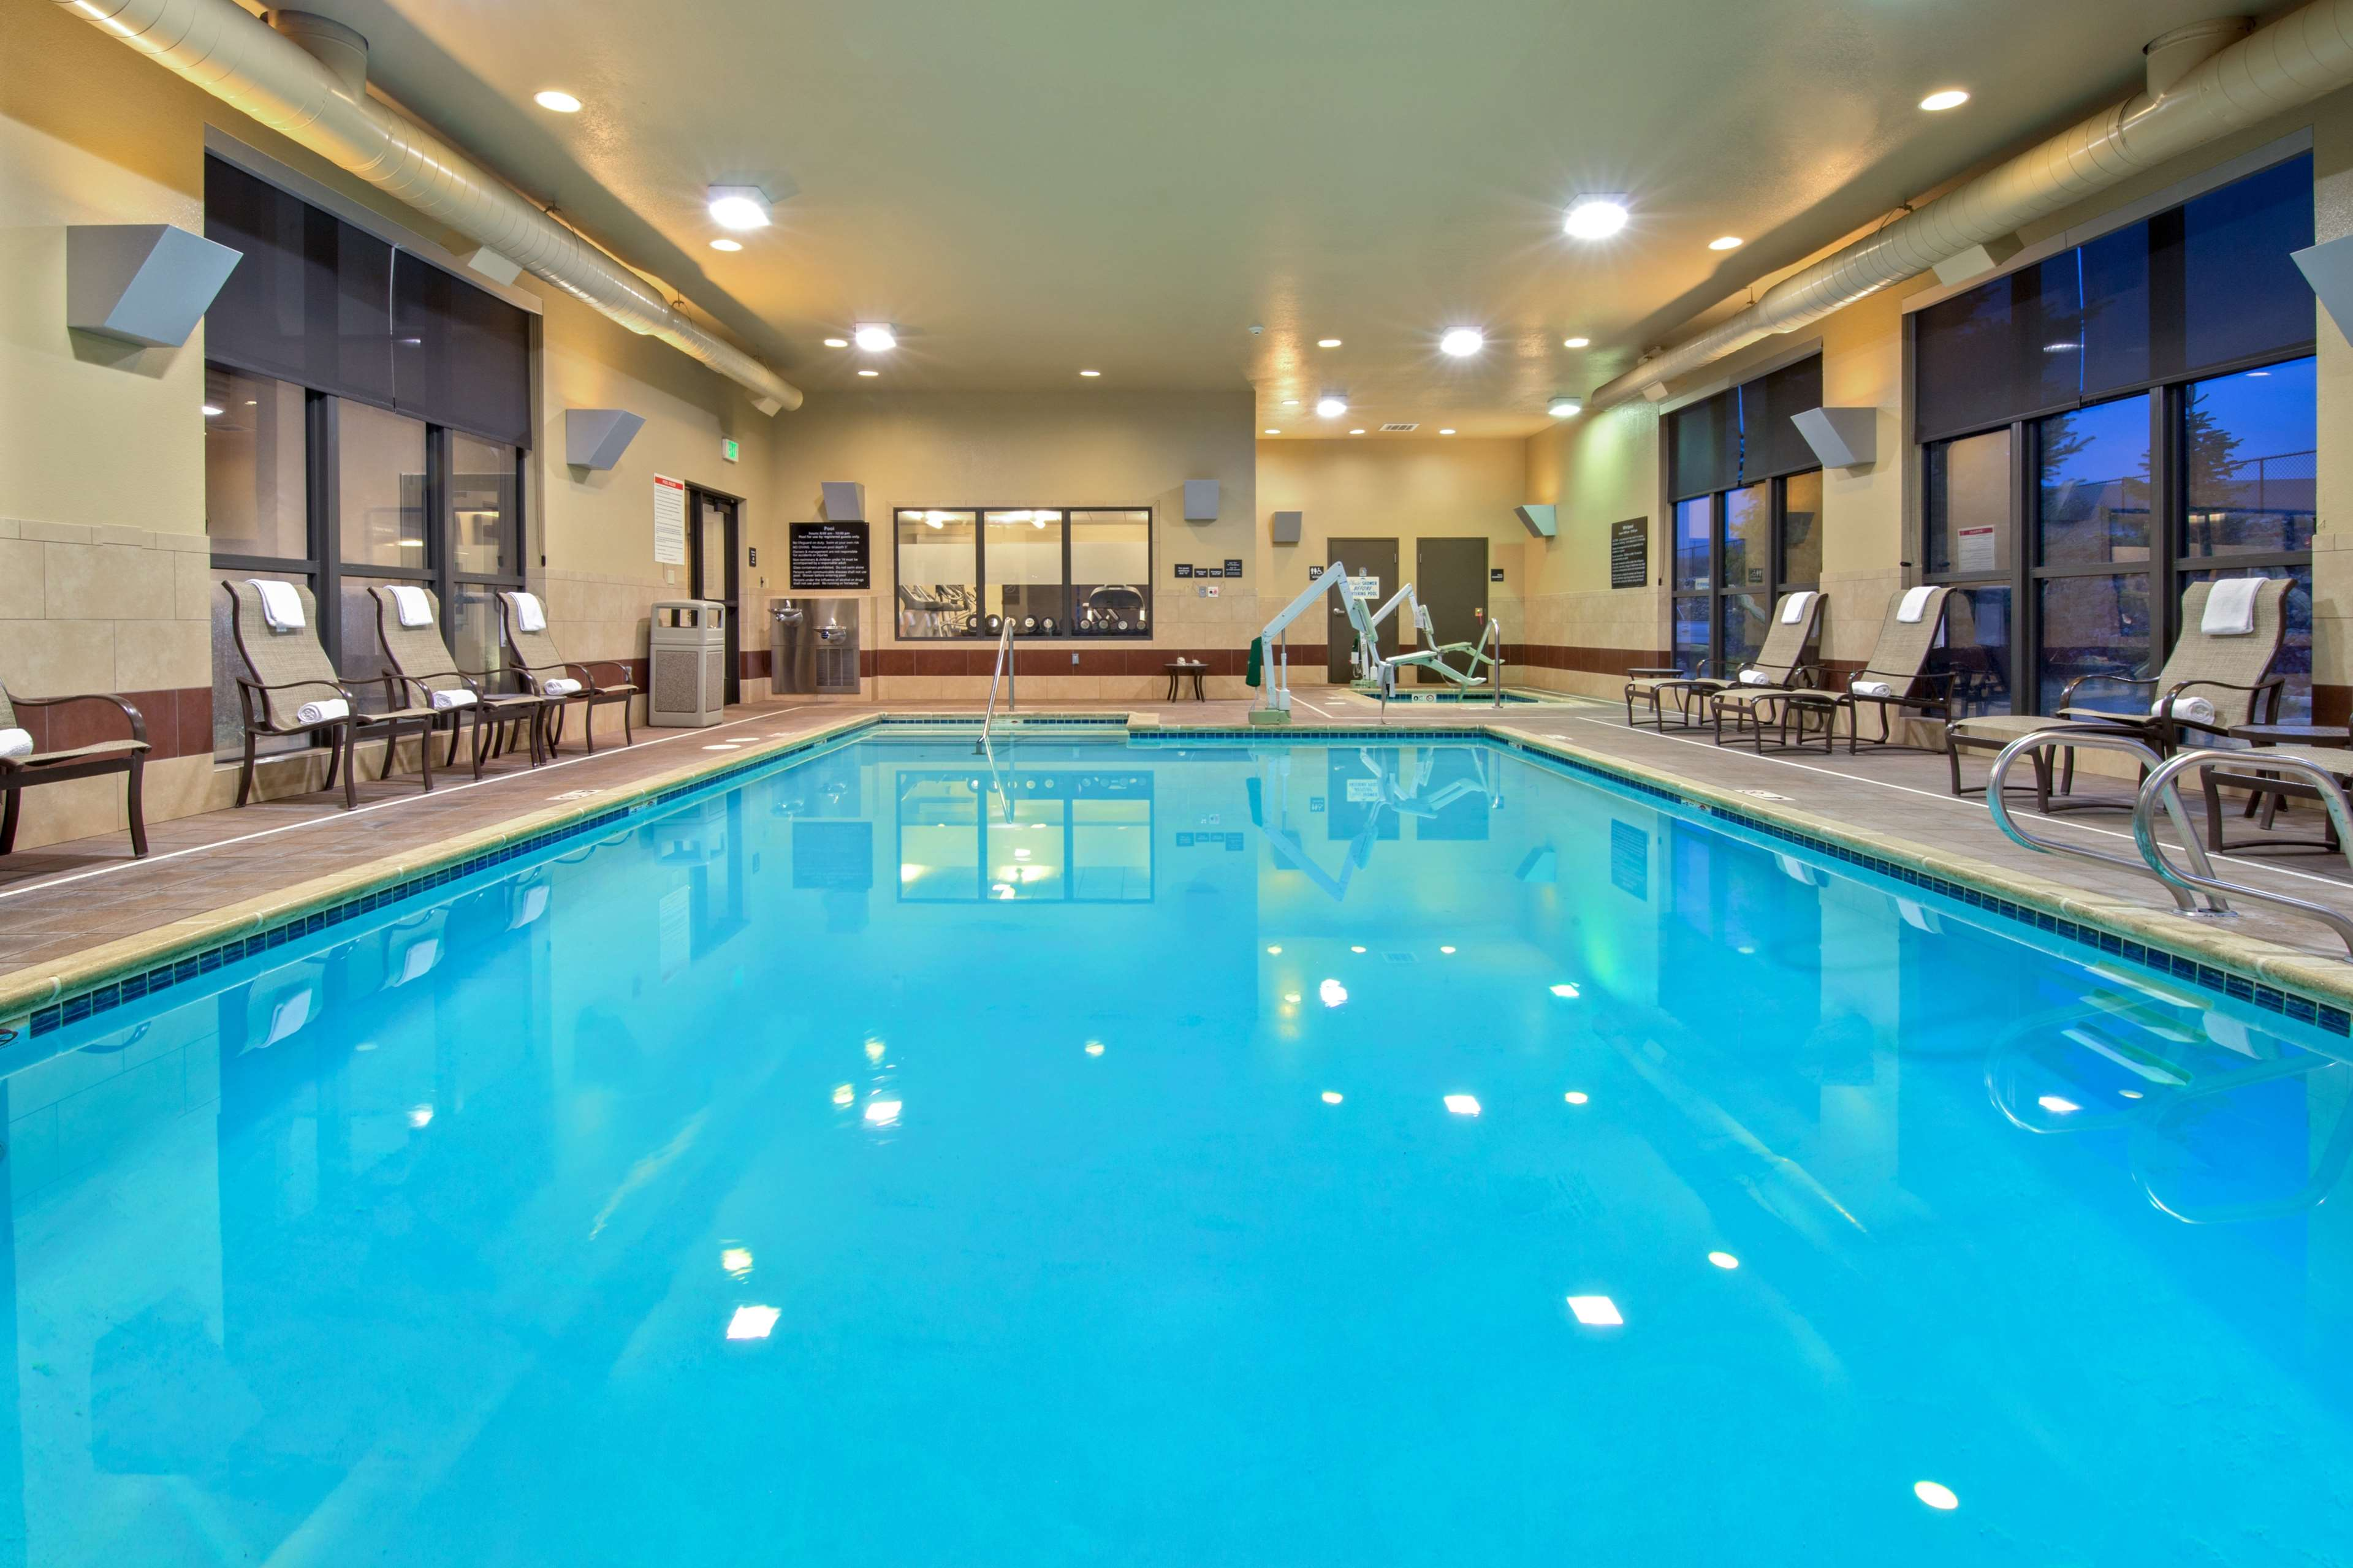 Hampton Inn & Suites Spokane Valley image 10